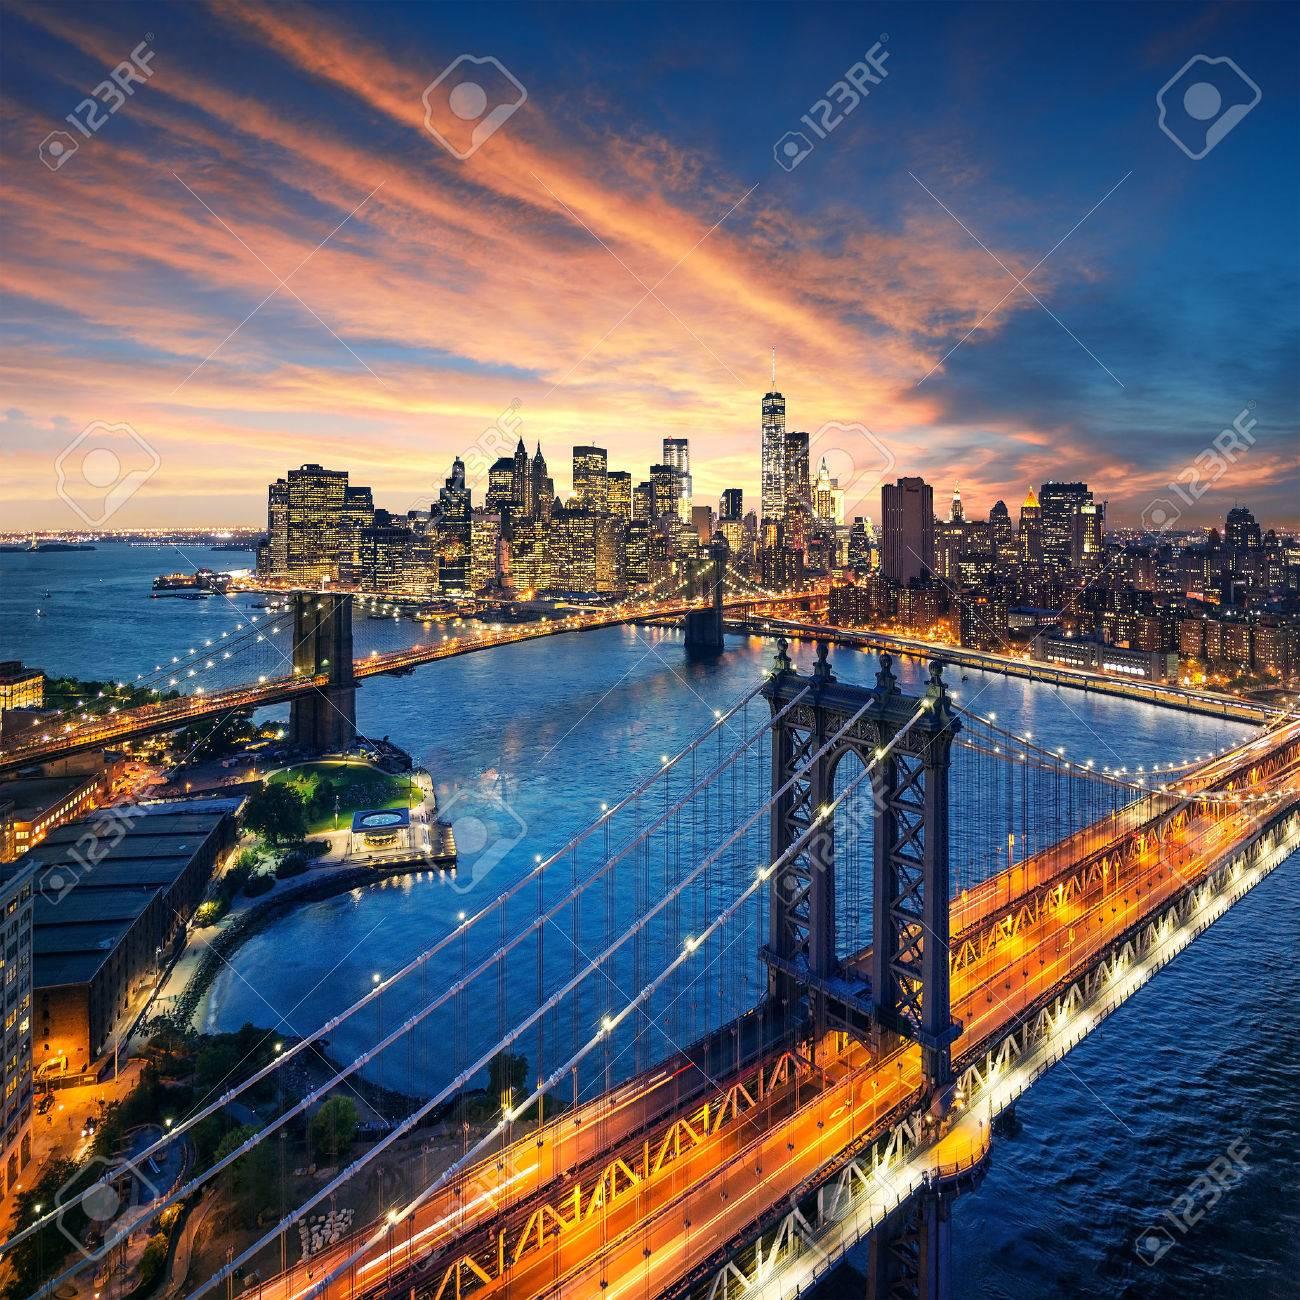 New York City - beautiful sunset over manhattan with manhattan and brooklyn bridge - 32773698